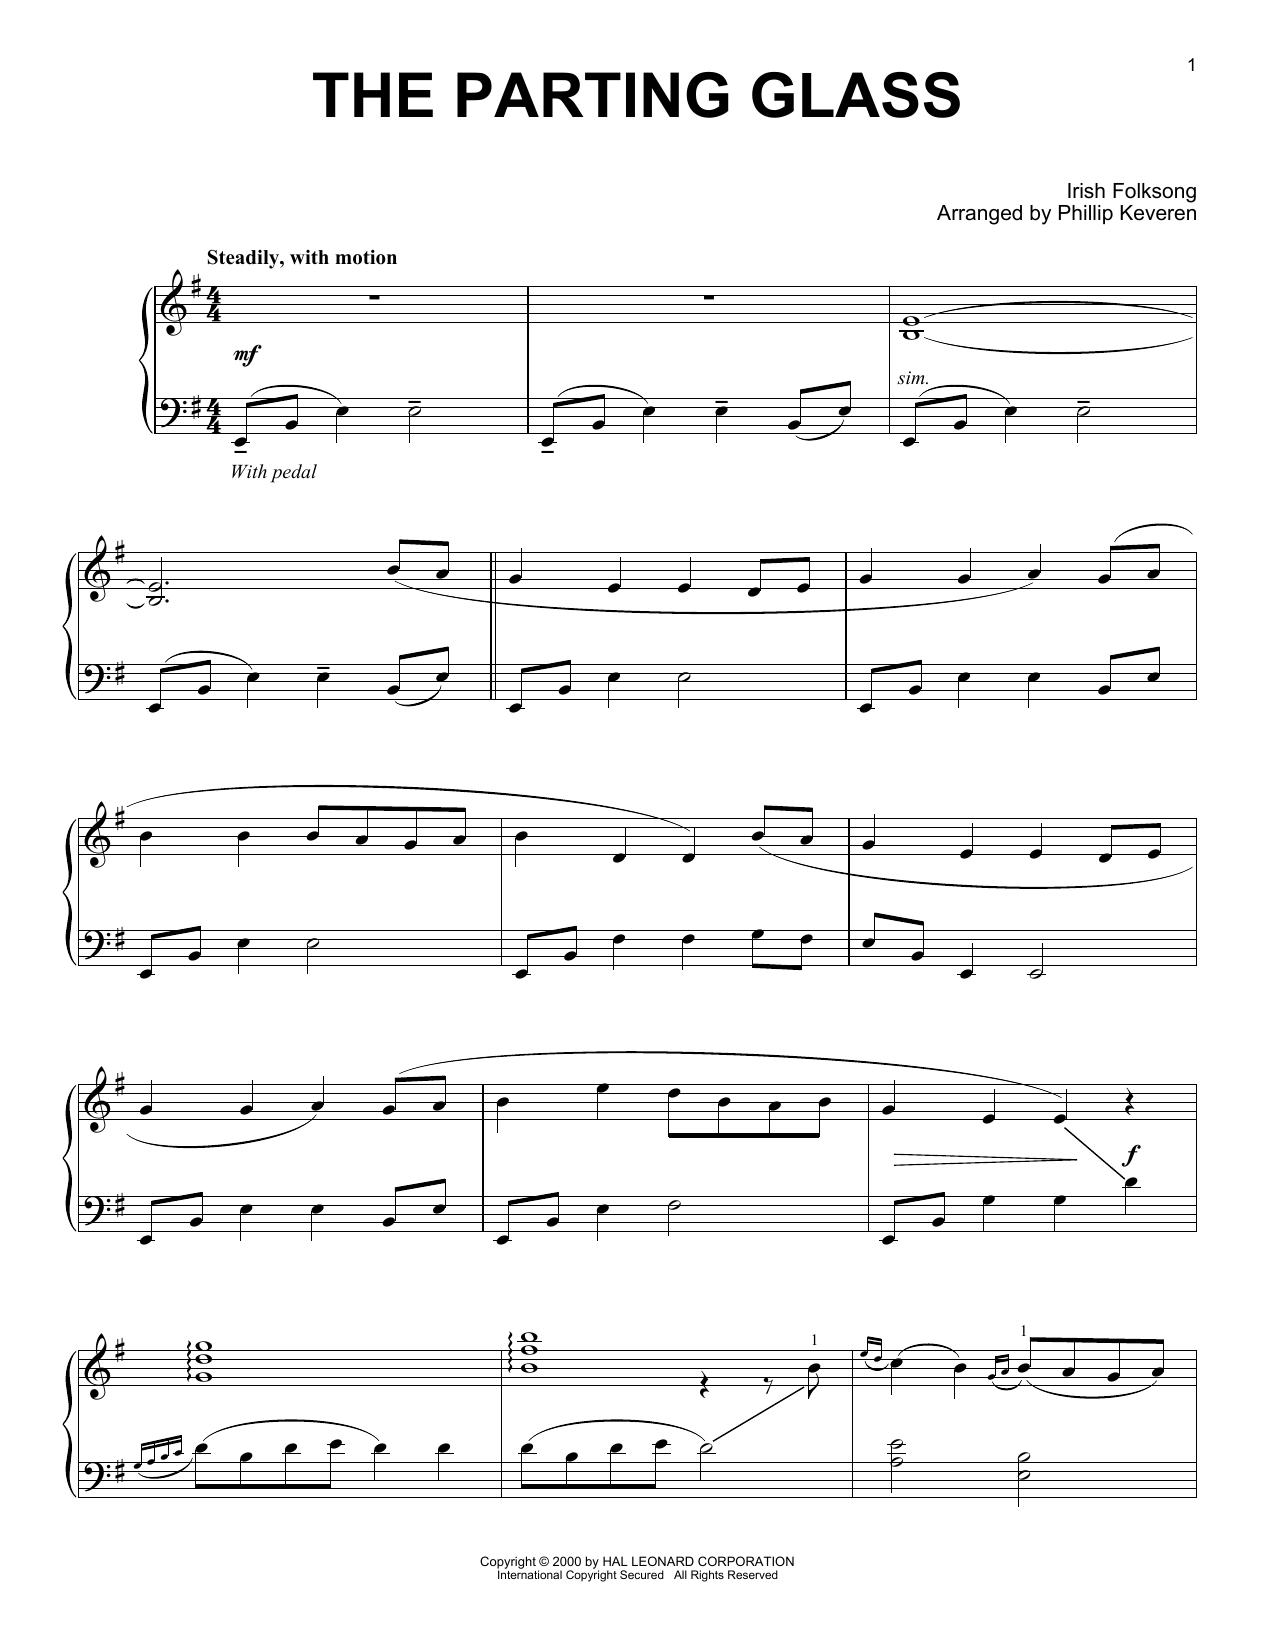 The Parting Glass (arr. Phillip Keveren) (Piano Solo)